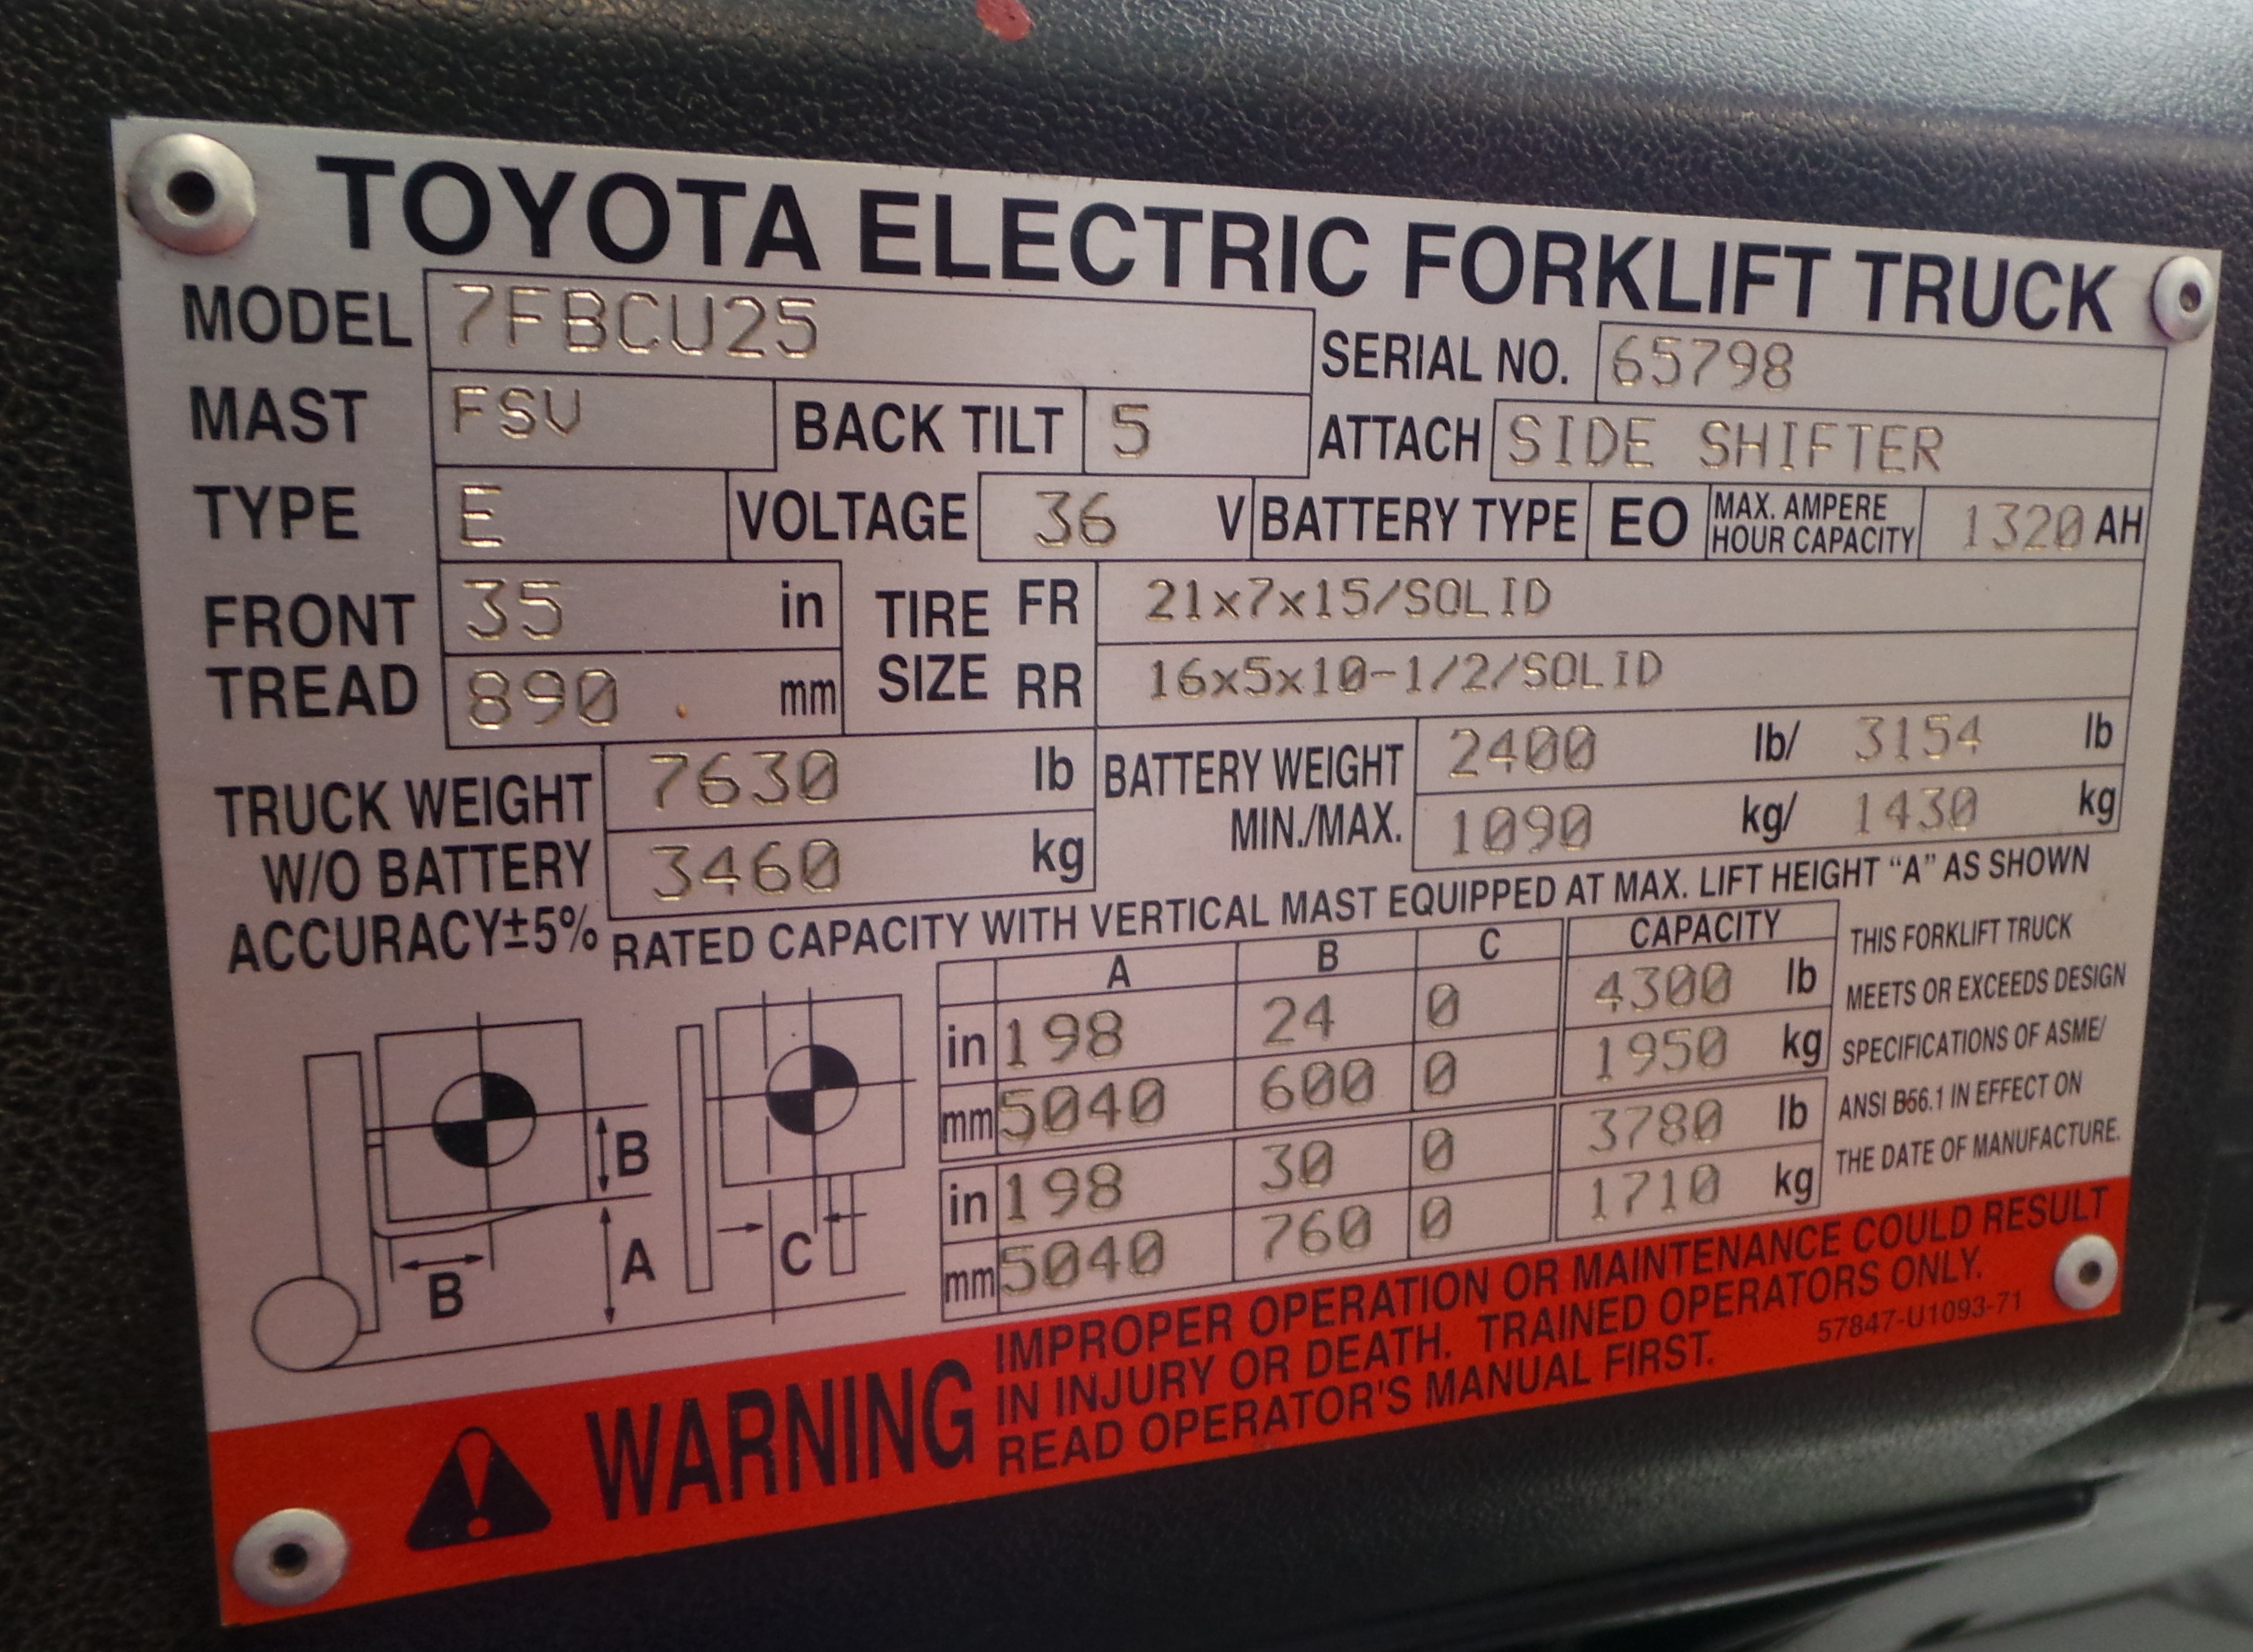 Toyota Forklift Oil Weight Best Fork 2017